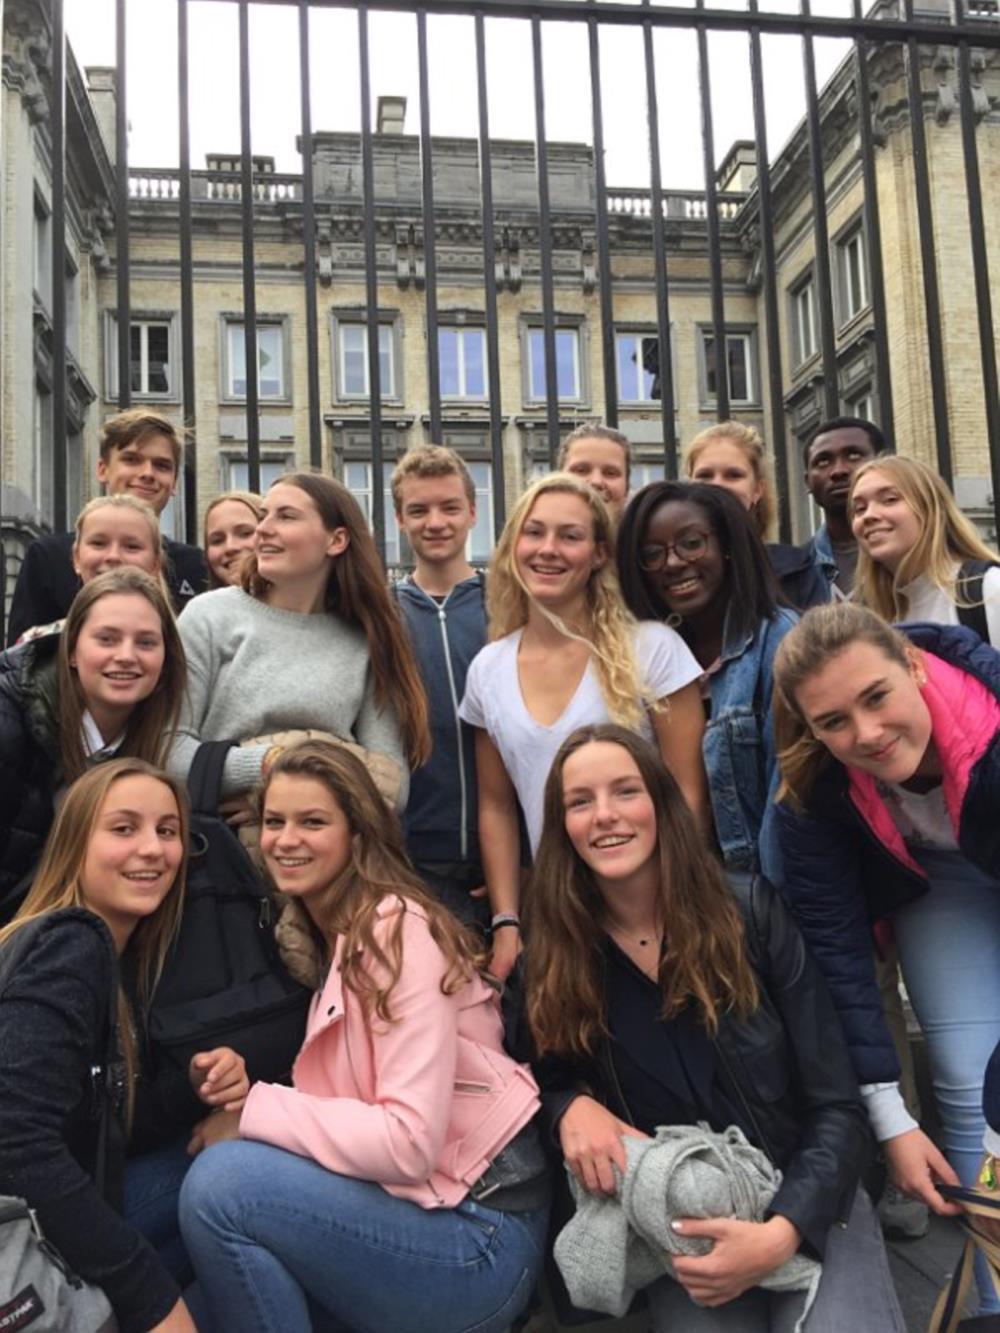 Bezoek federaal parlement Brussel (6HWE)